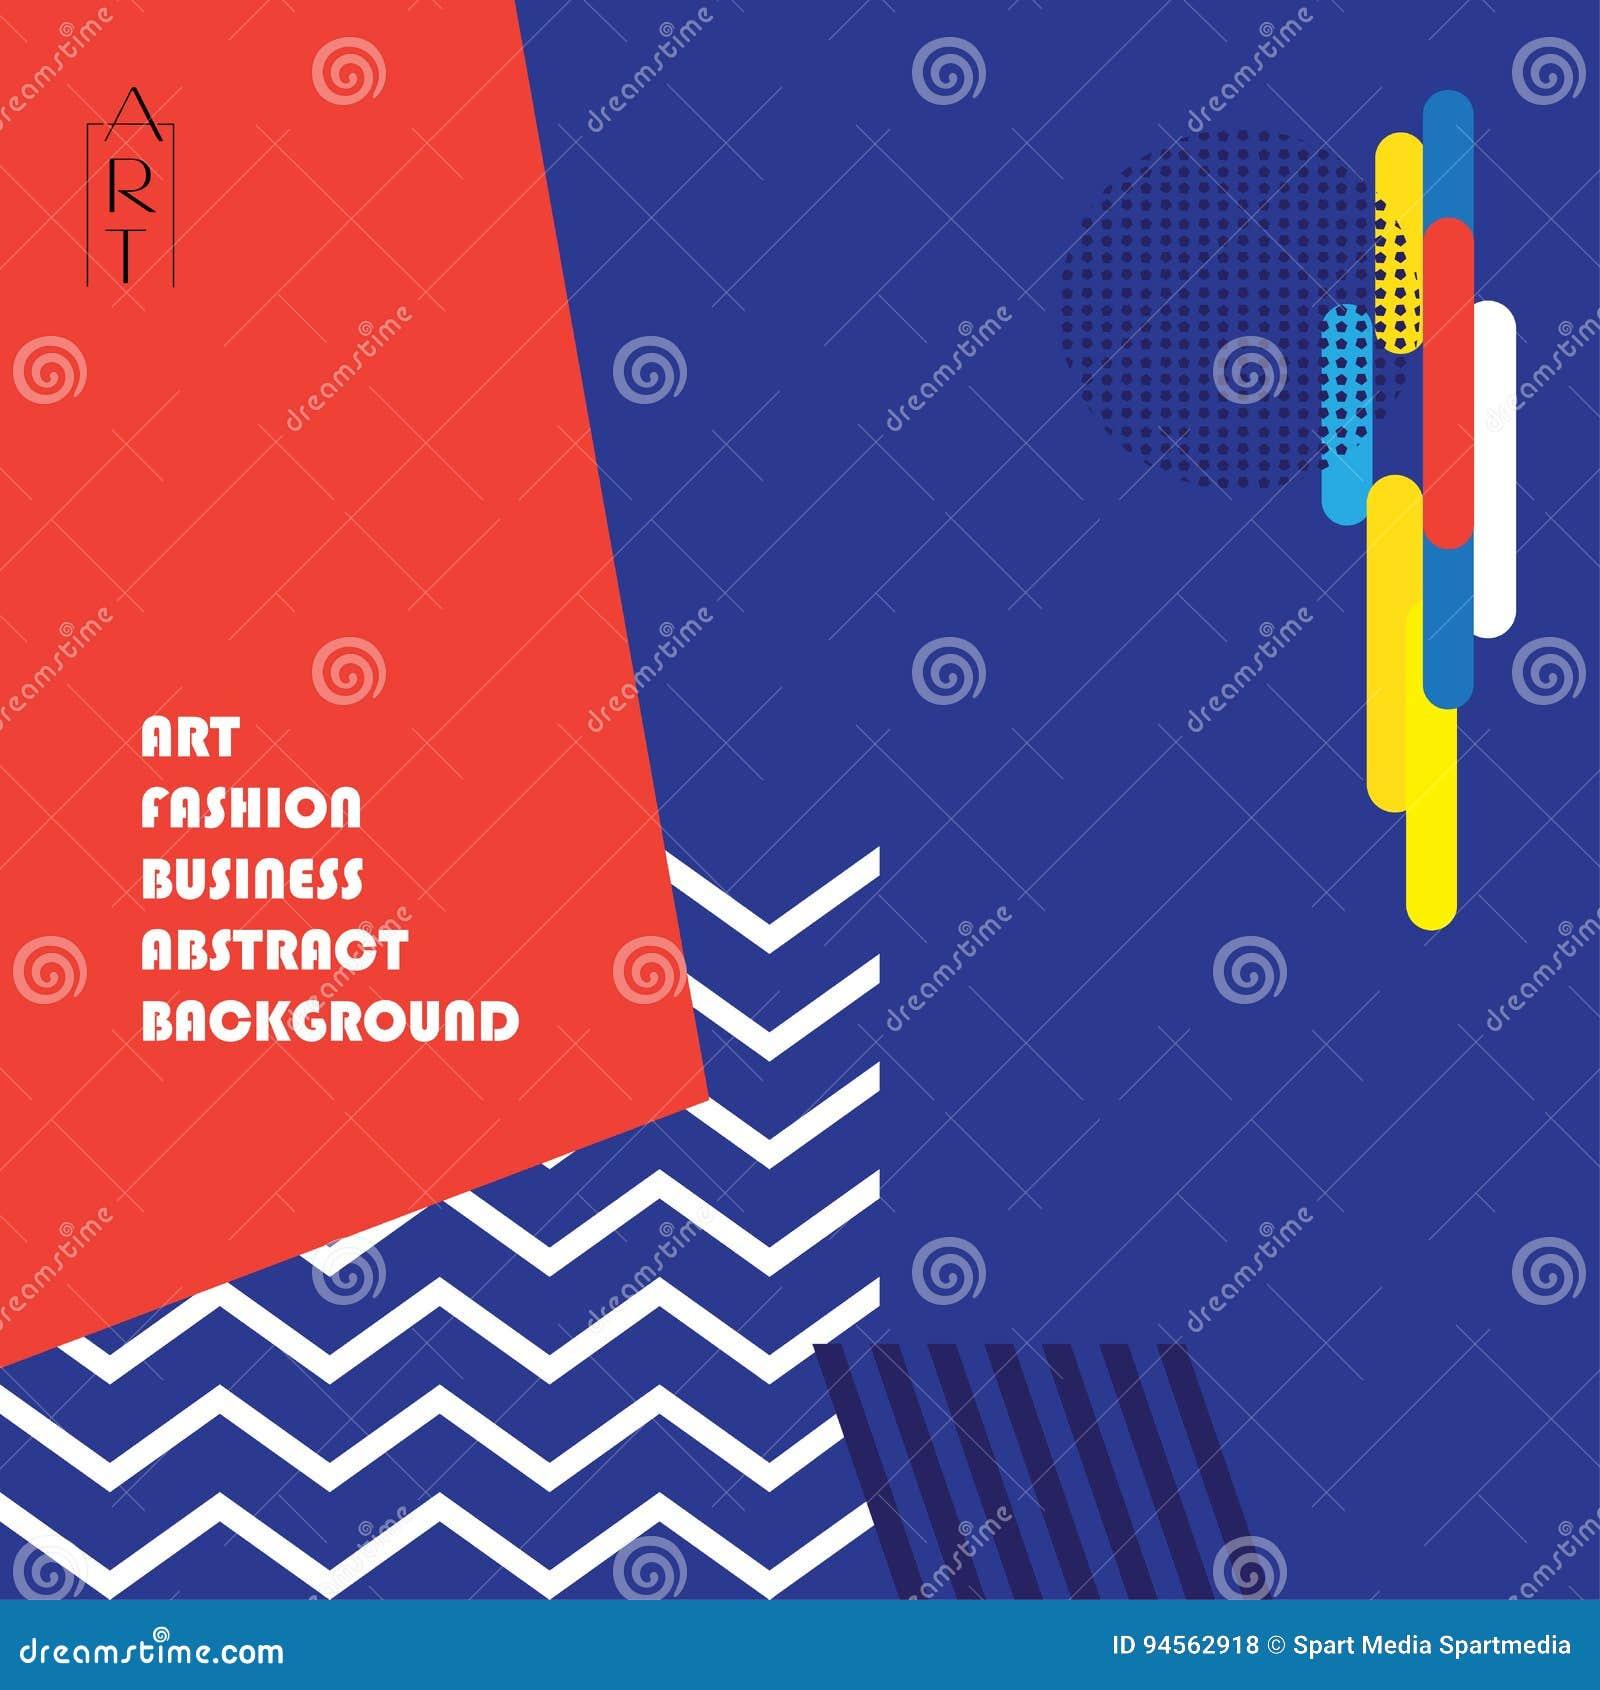 Modern Art Exhibition Poster Stock Vector Illustration Of Design